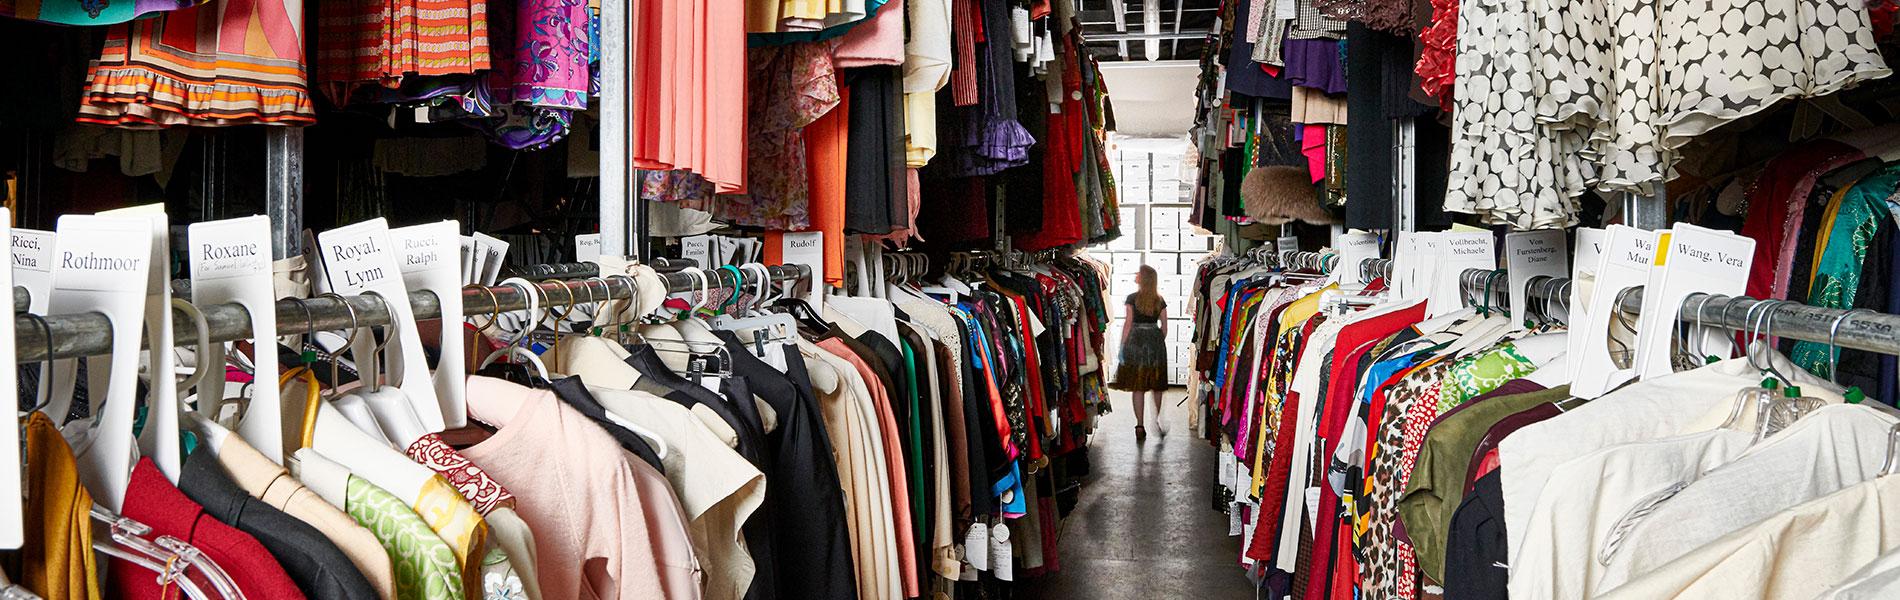 Texas Fashion Collection Texas Fashion Collection